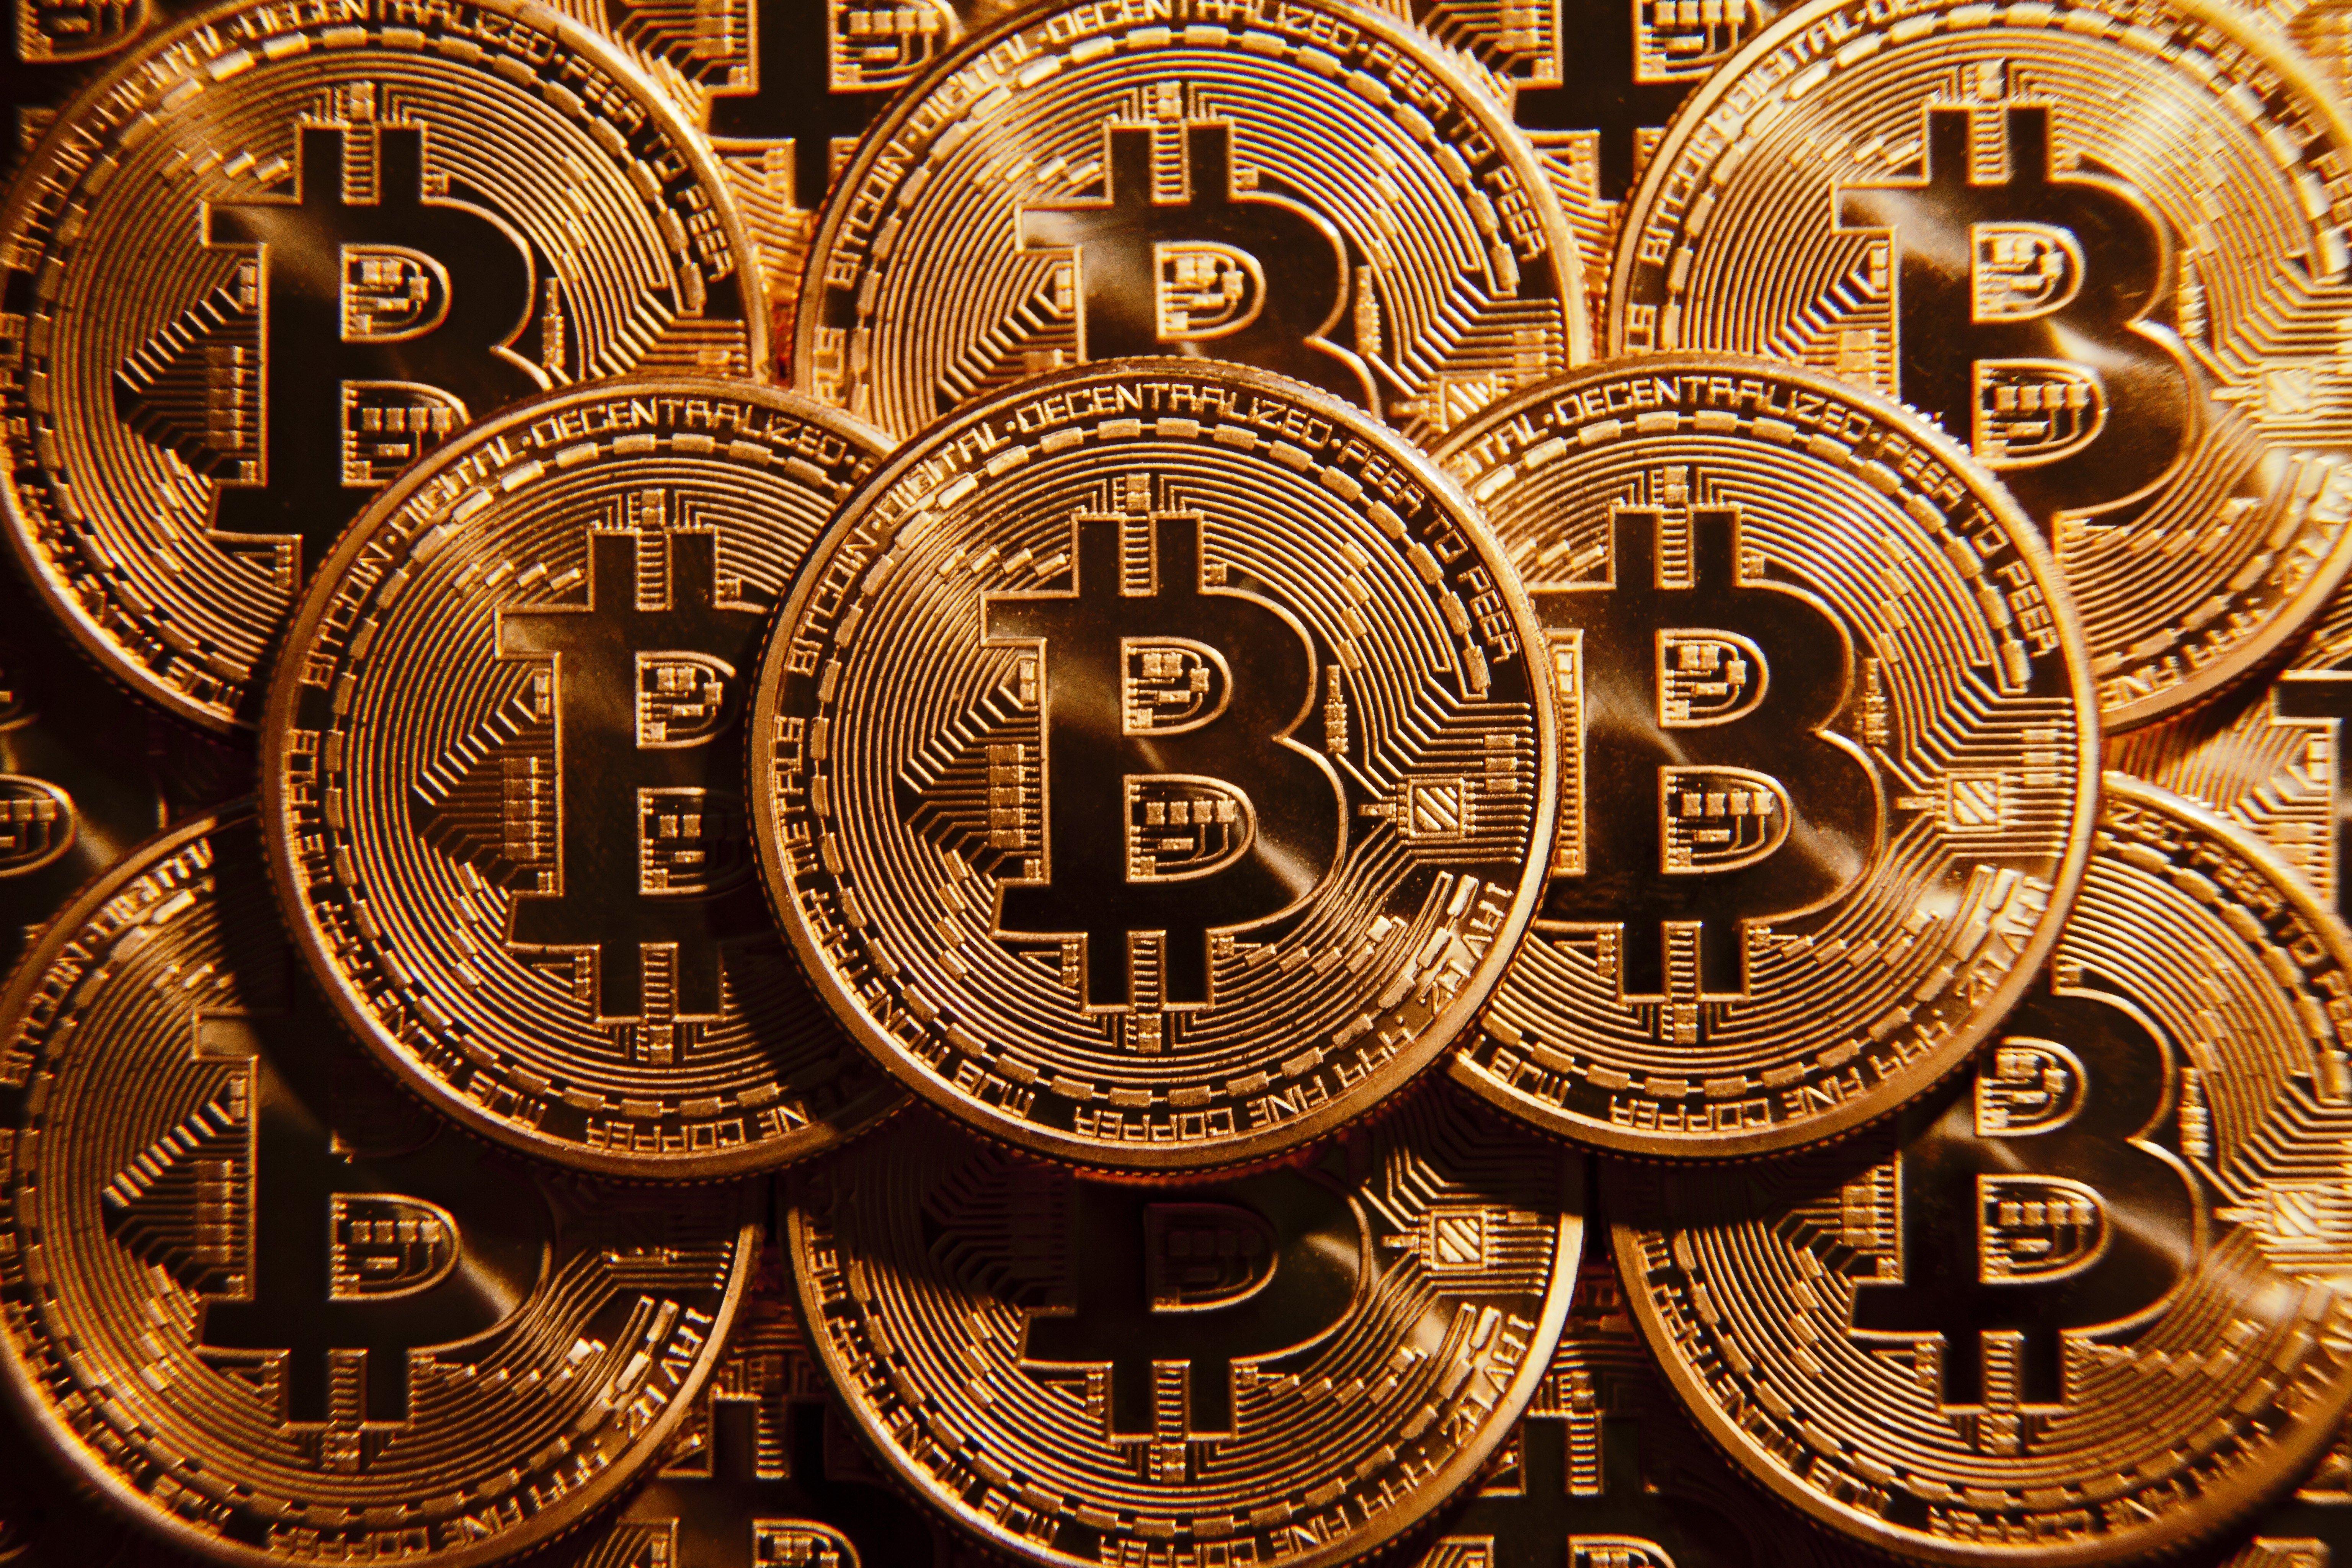 Bitcoin Value Surpasses Previous Peak